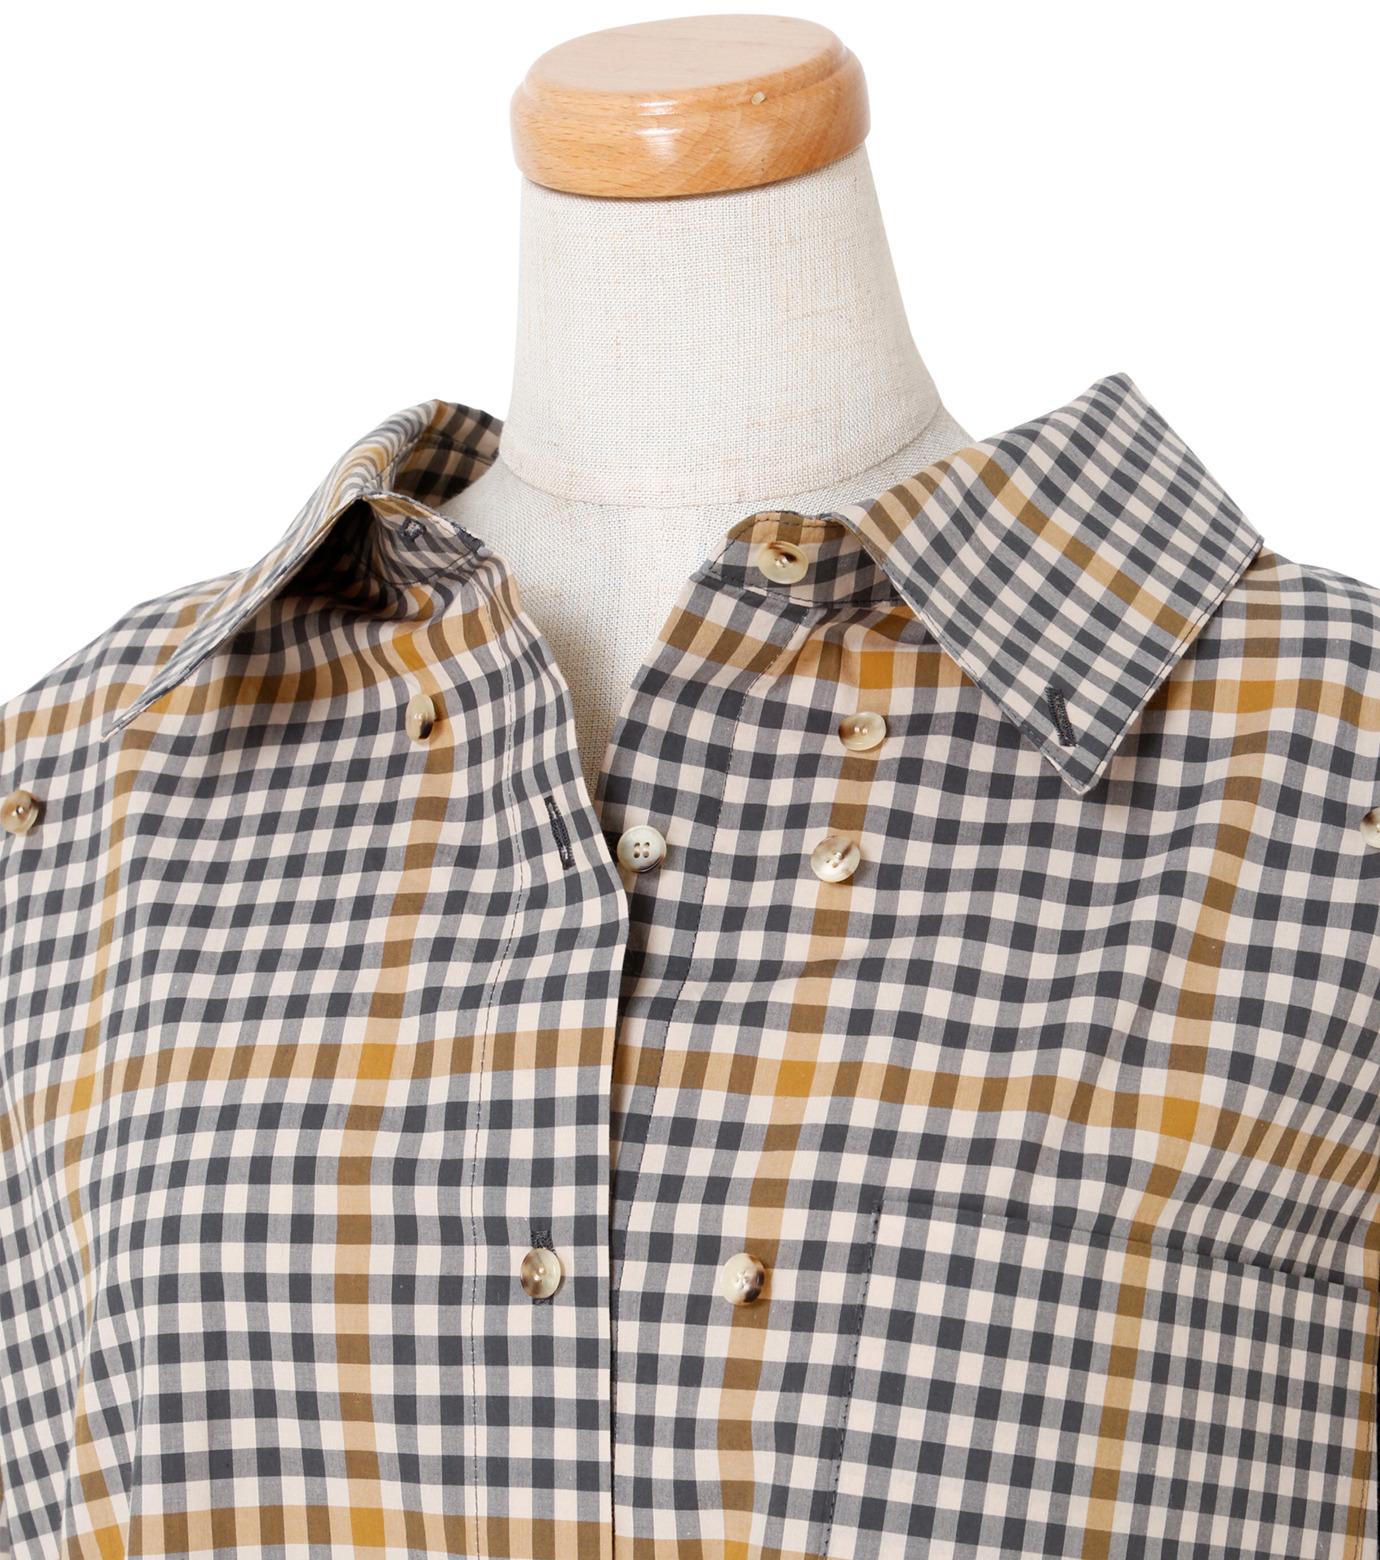 IRENE(アイレネ)のグラフチェックシャツ-LIGHT BEIGE(シャツ/shirt)-19S83001 拡大詳細画像4